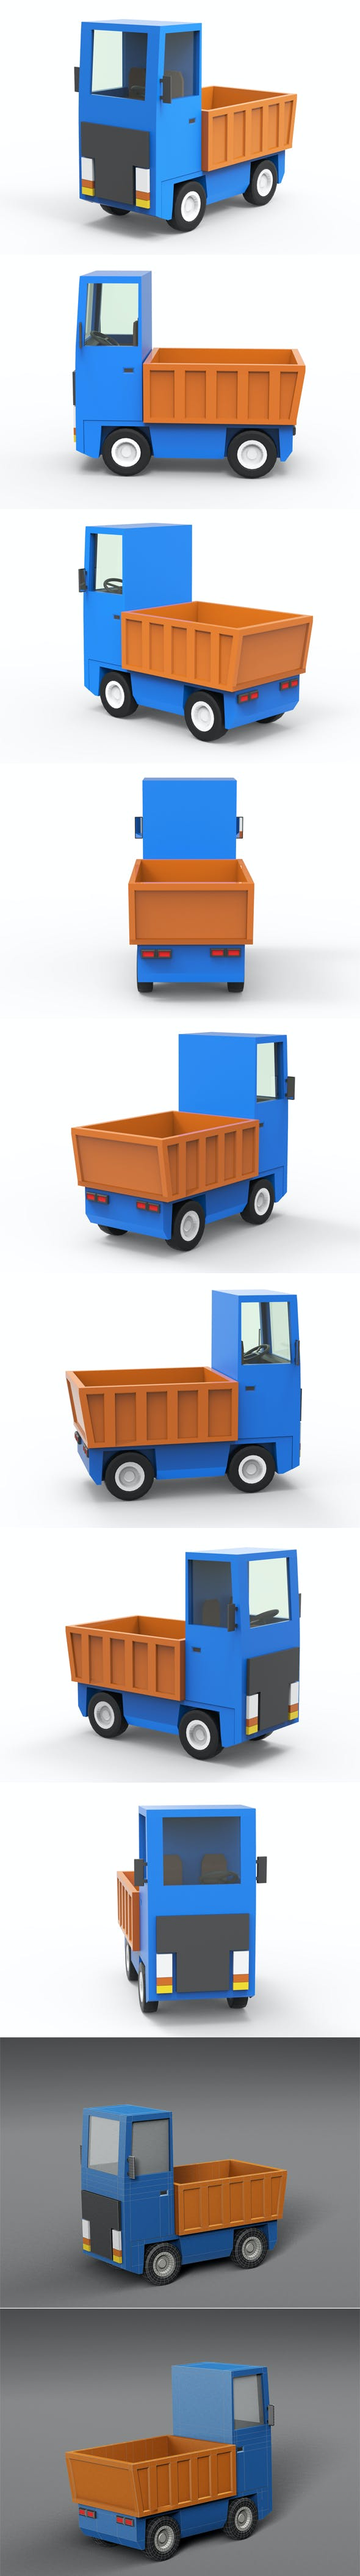 Cartoon freight car - 3DOcean Item for Sale